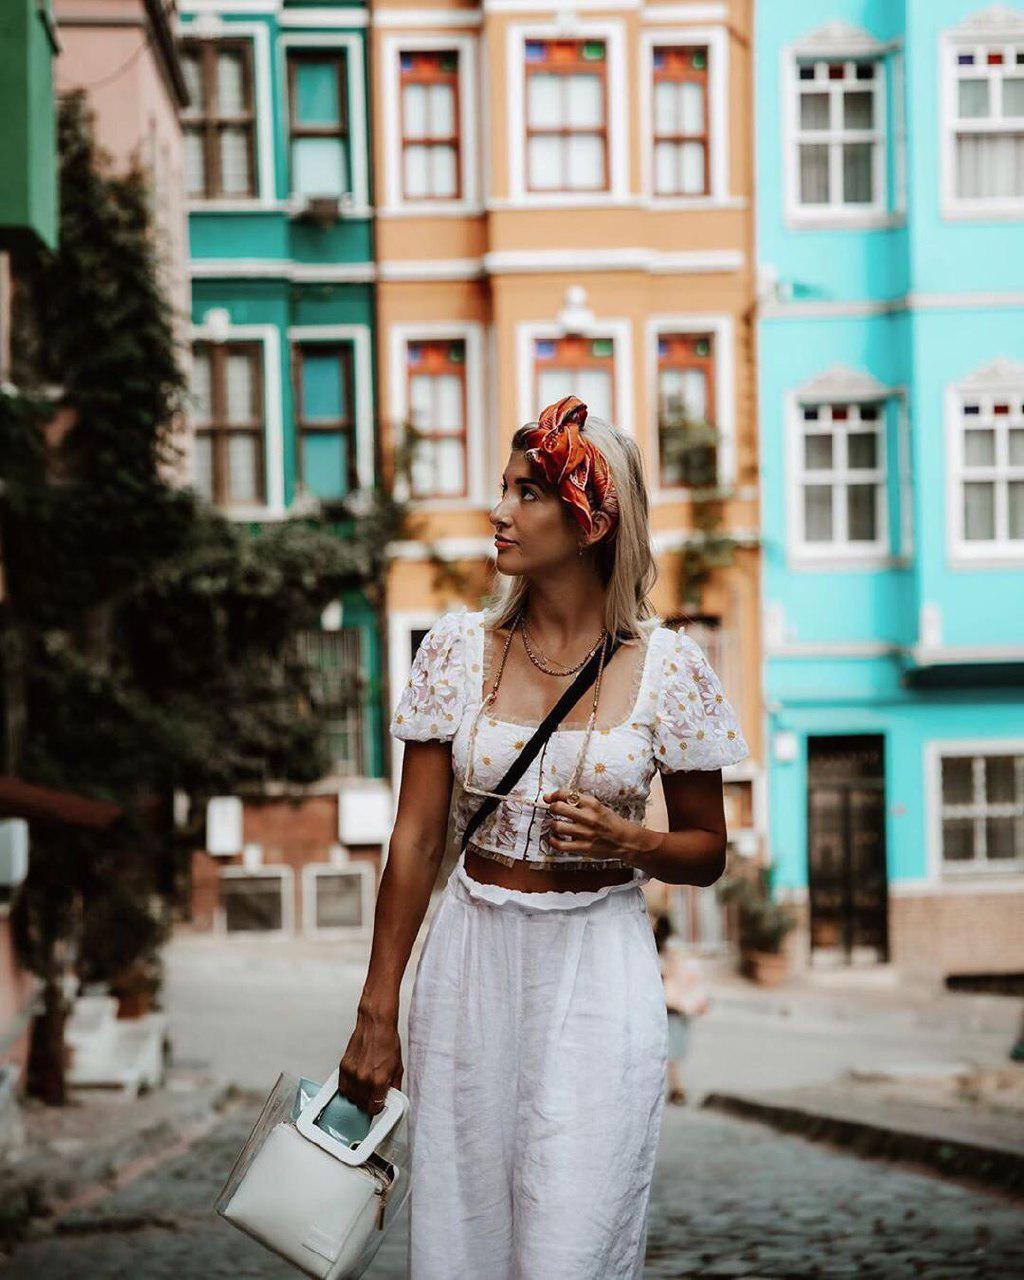 Turkish Airlines, Turkey, Турция, Стамбул, Sparkle Travel